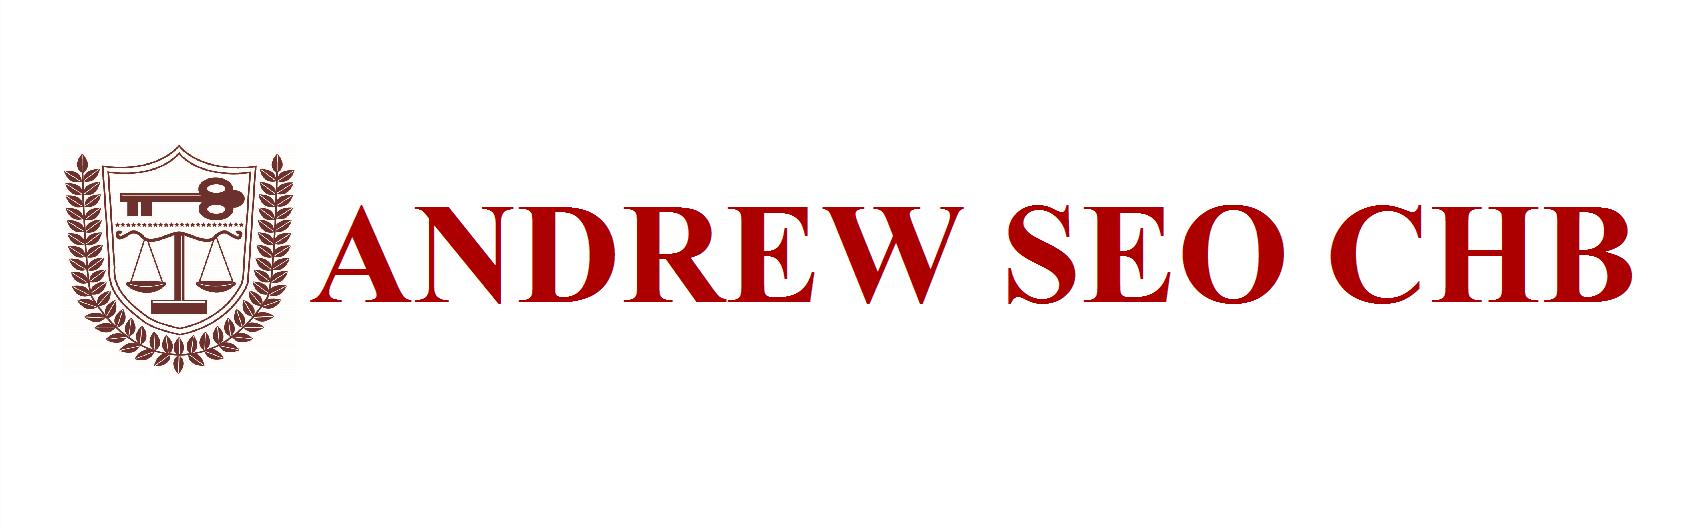 andrewseo_logo